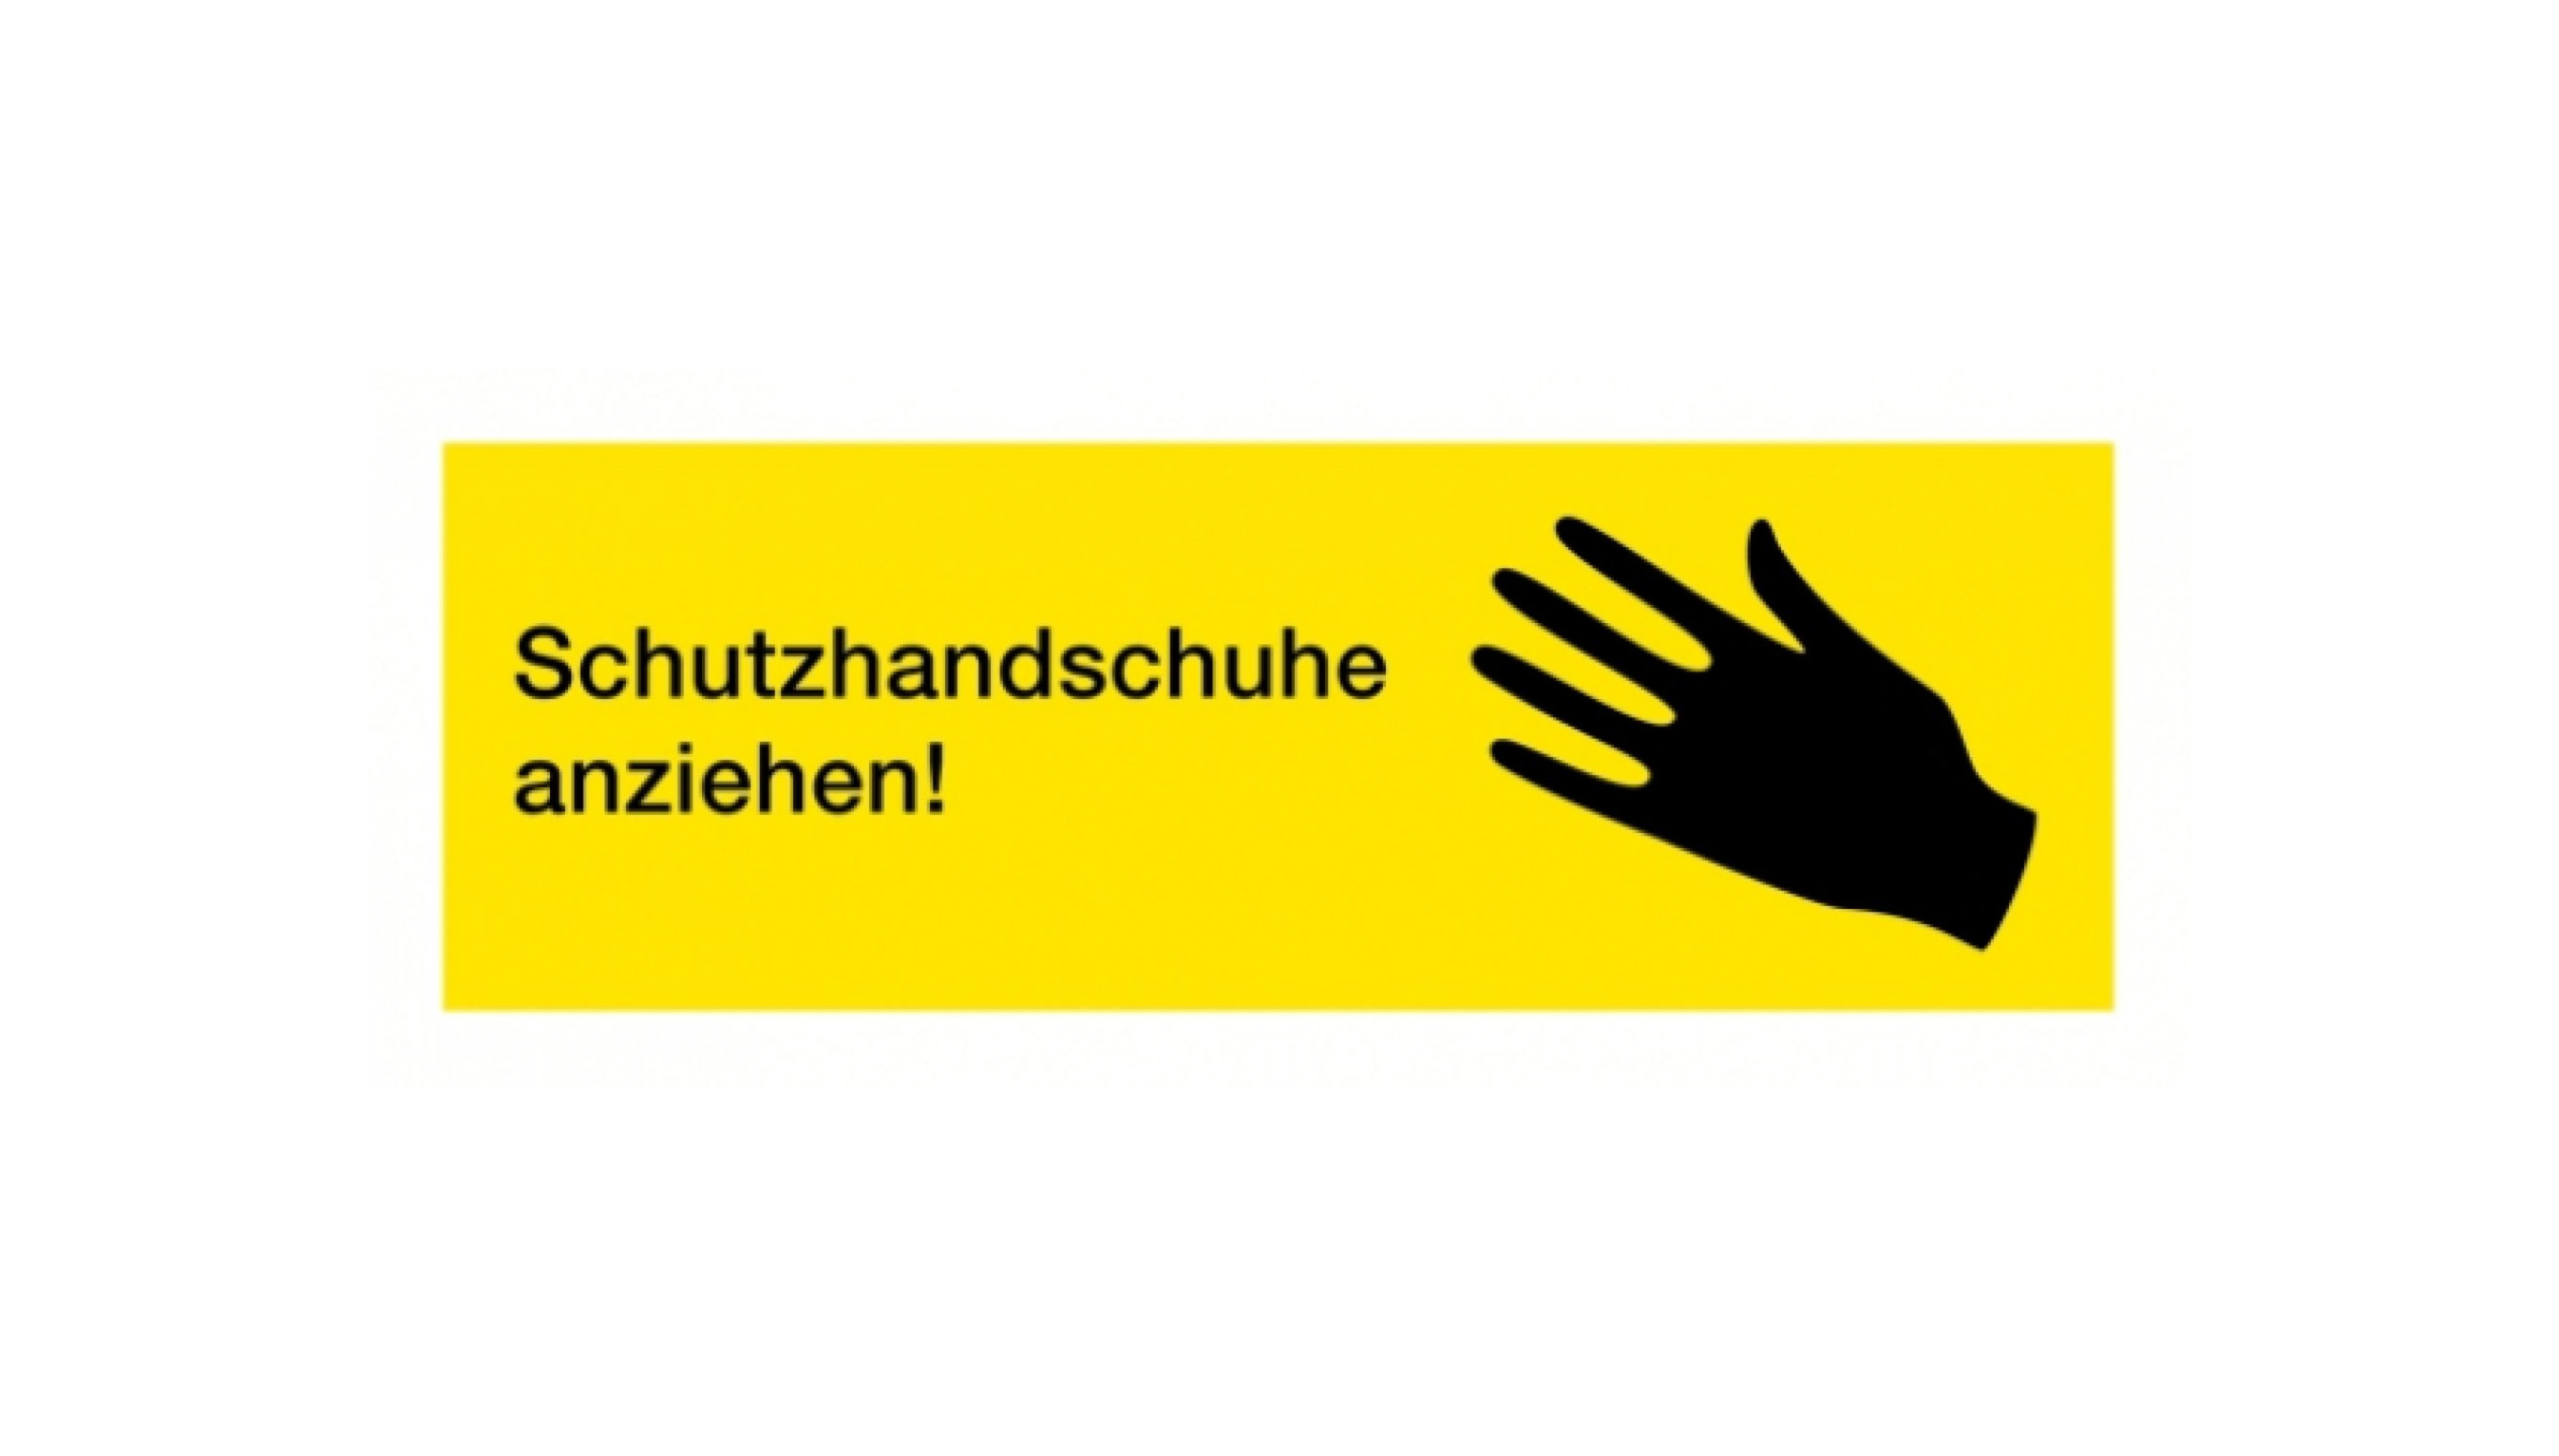 Normsymbol: Schutzhandschuhe anziehen 109 x 37 mm